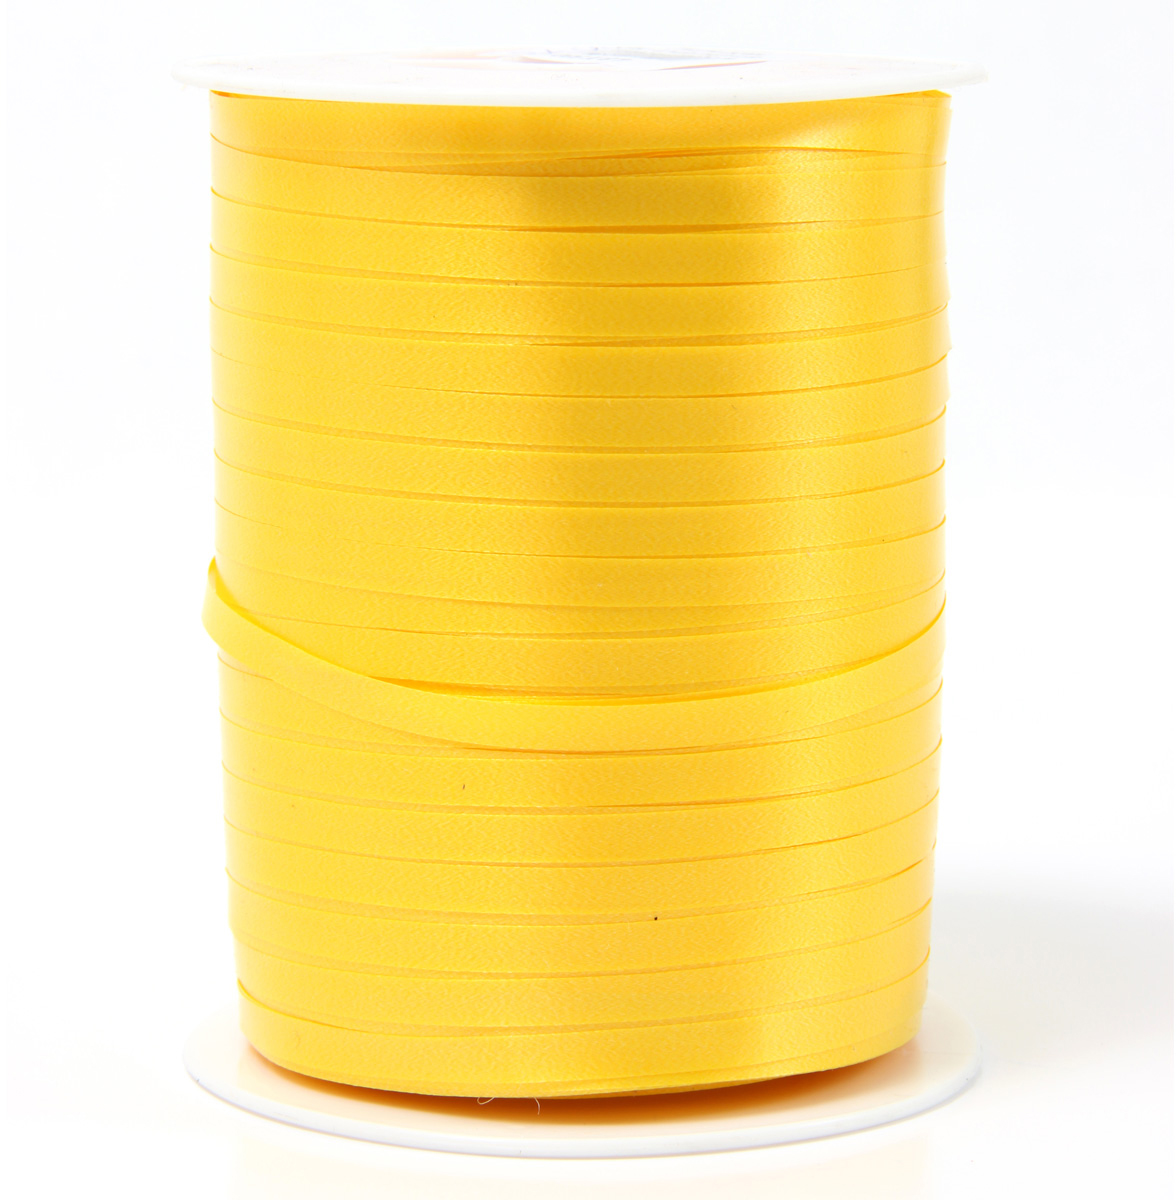 Лента полипропеленовая на бабине. Размер 0.48см х 500м желтая